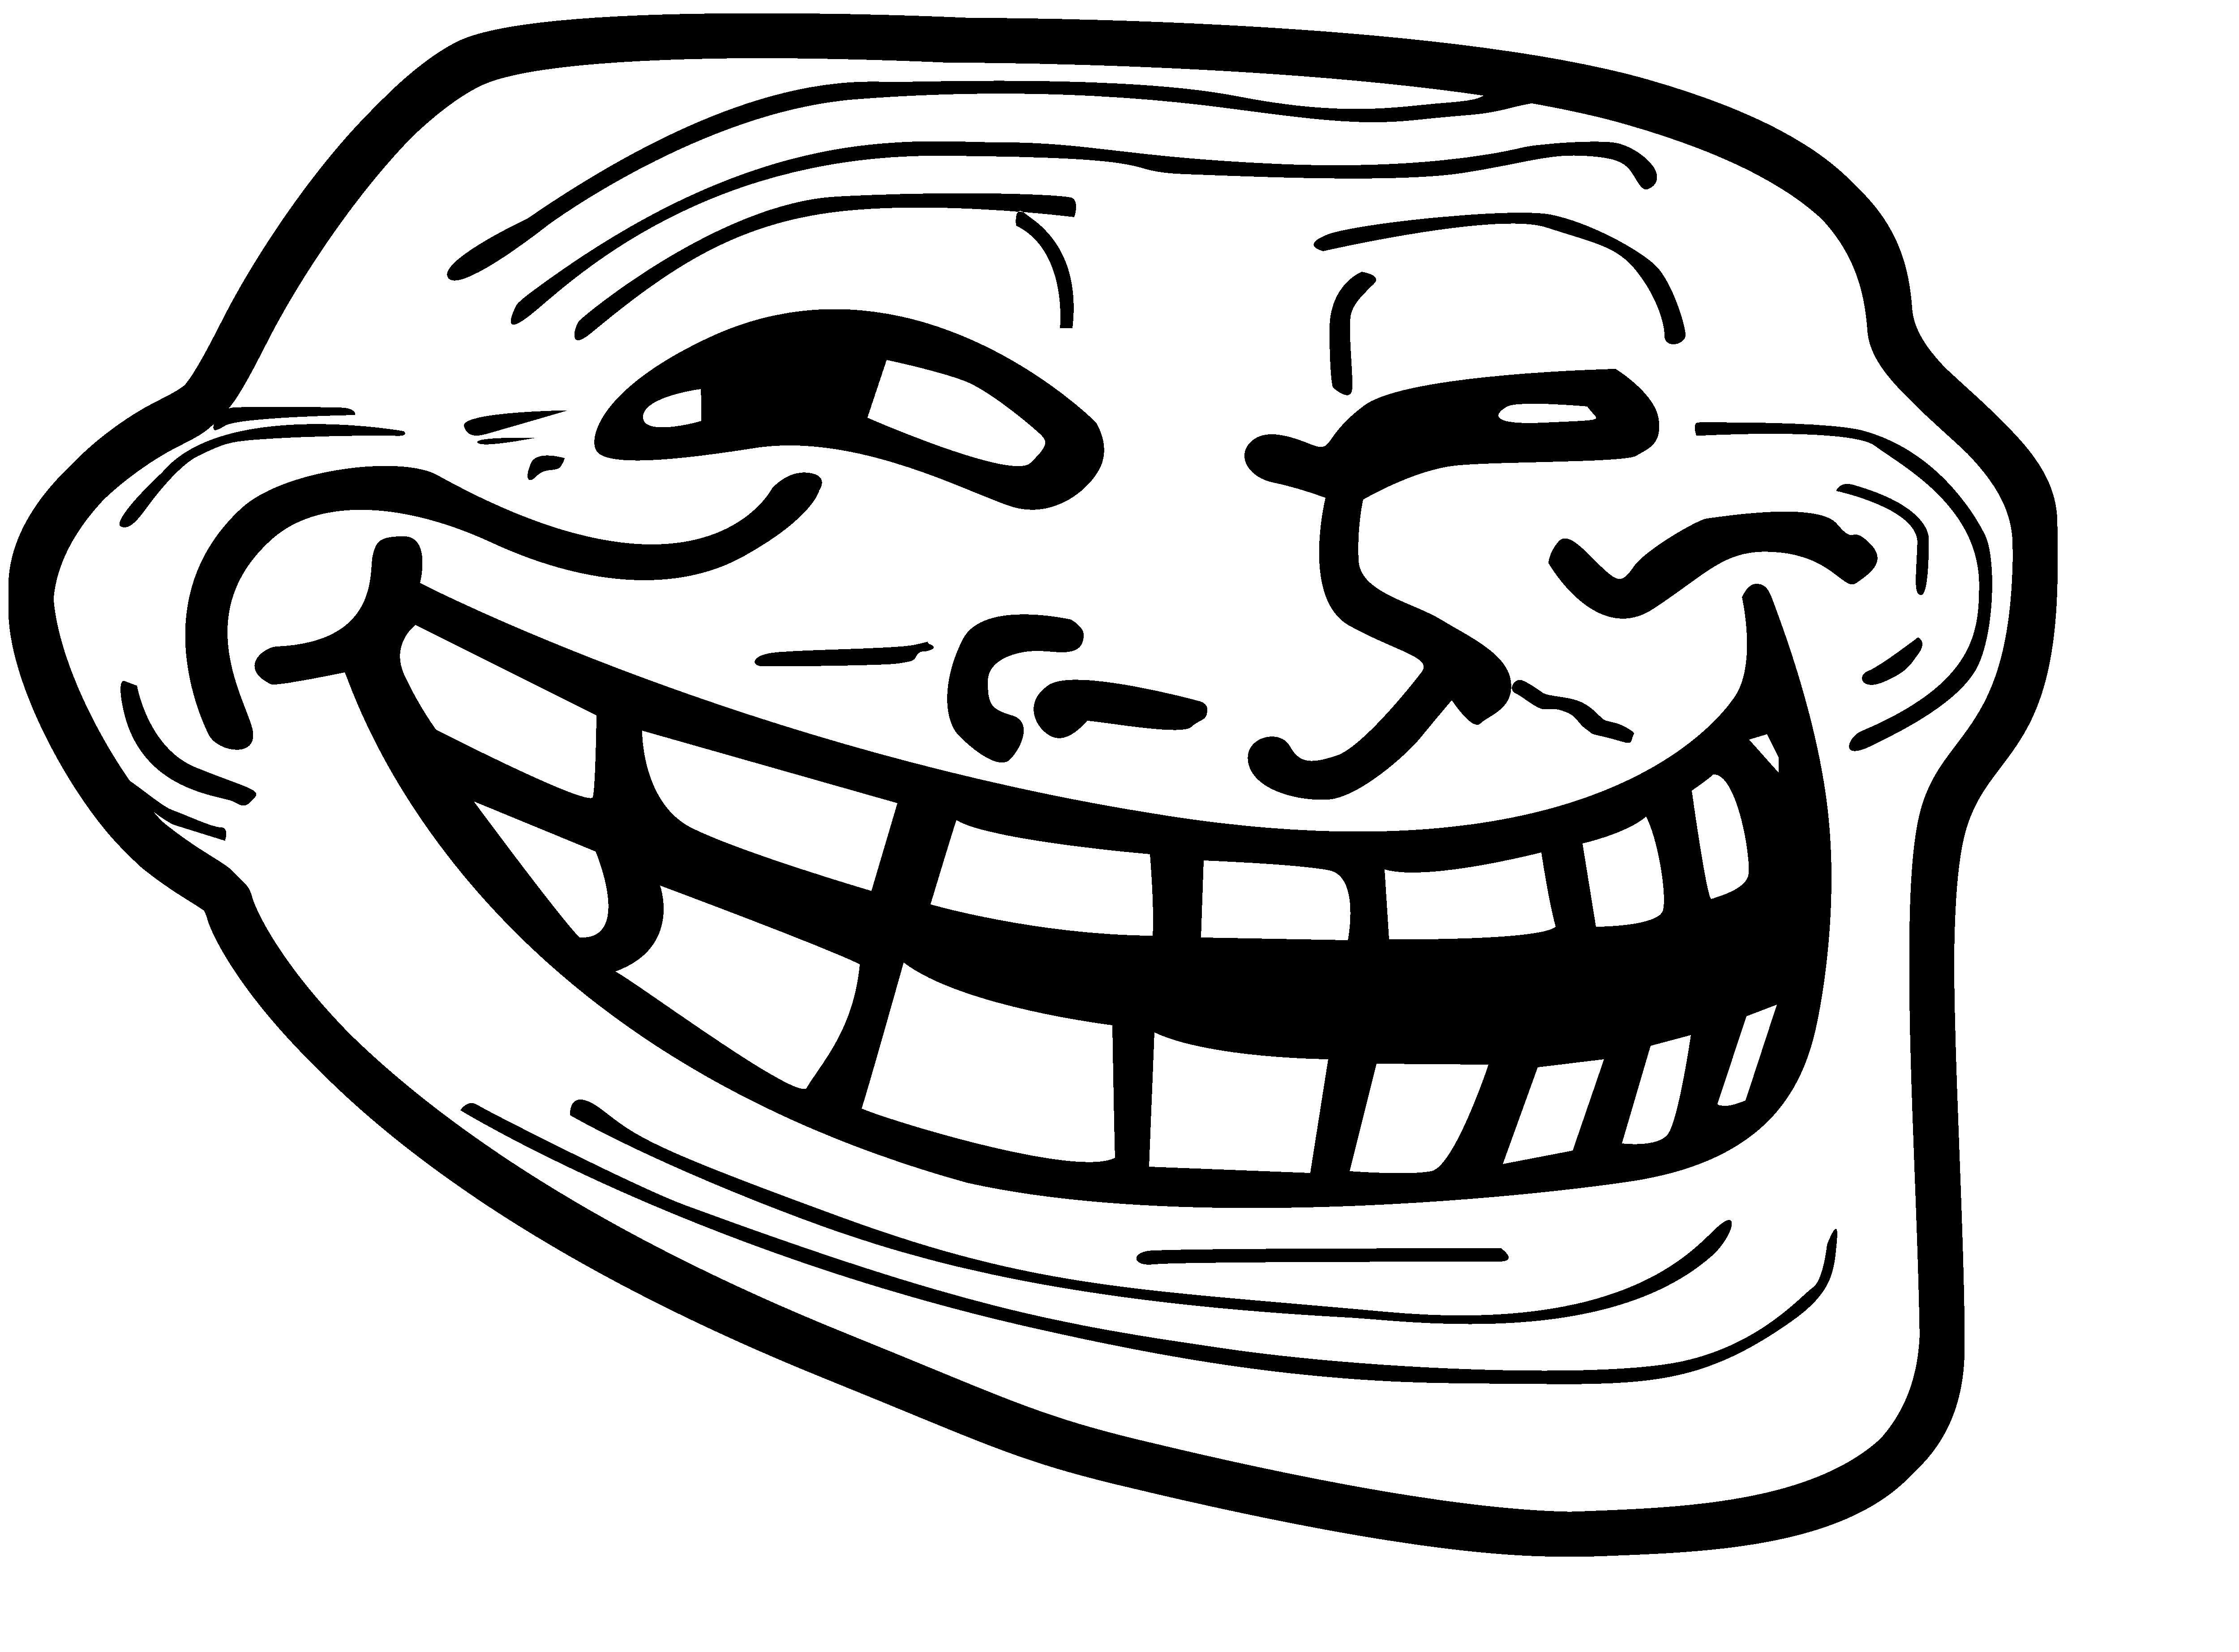 Cartoonbigdick troll cartoon toons